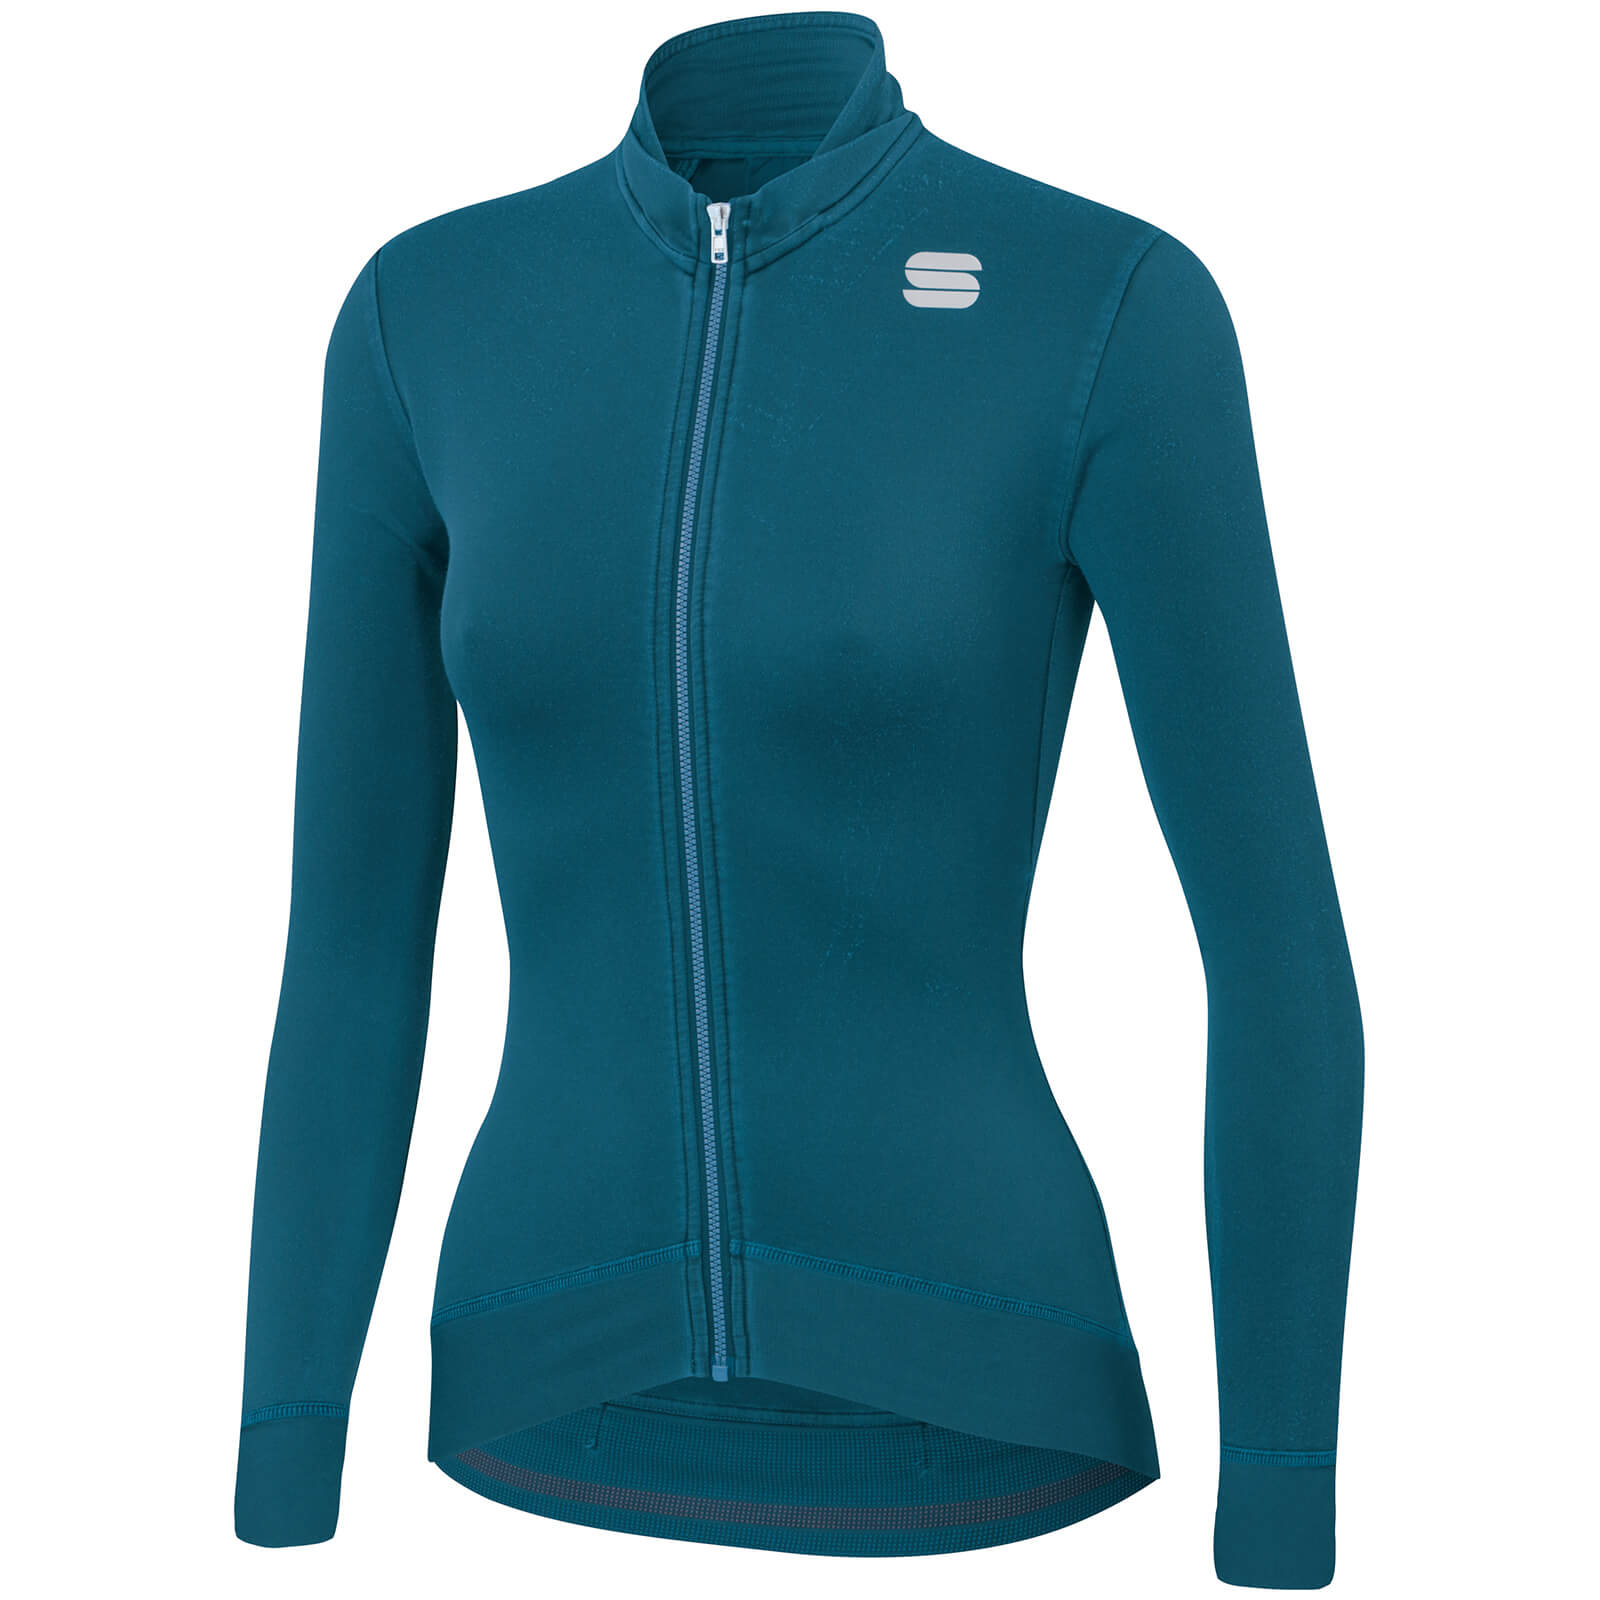 Sportful Women's Monocrom Thermal Jersey - M - Blue Corsair